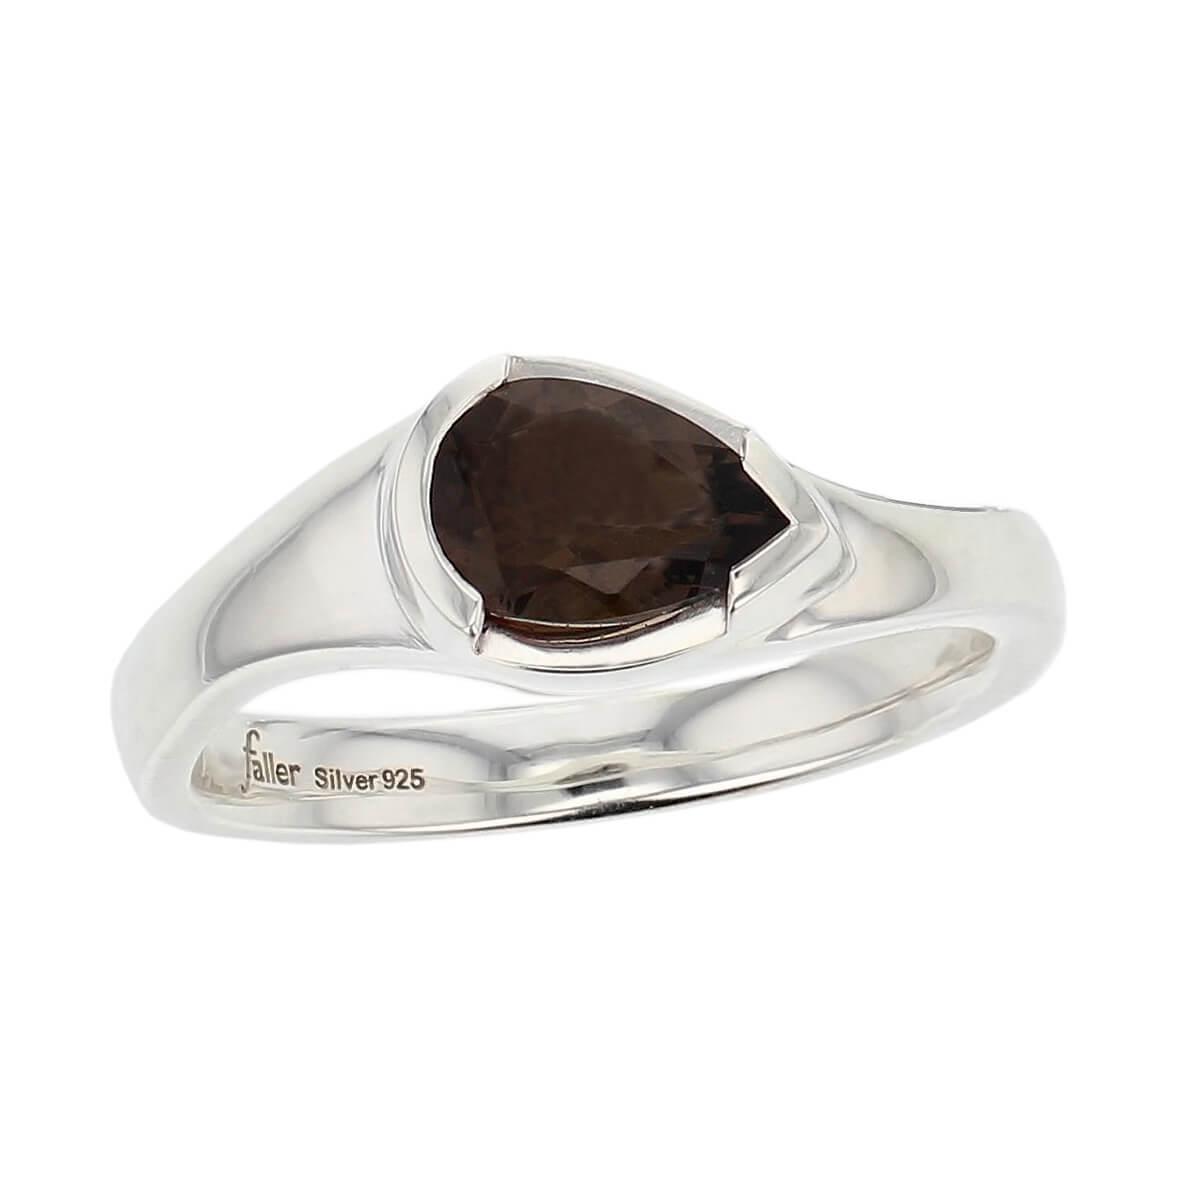 sterling silver pear cut faceted smoky quartz gemstone dress ring, designer jewellery, smokey quartz gem, jewelry, handmade by Faller, Londonderry, Northern Ireland, Irish hand crafted, darcy, D'arcy